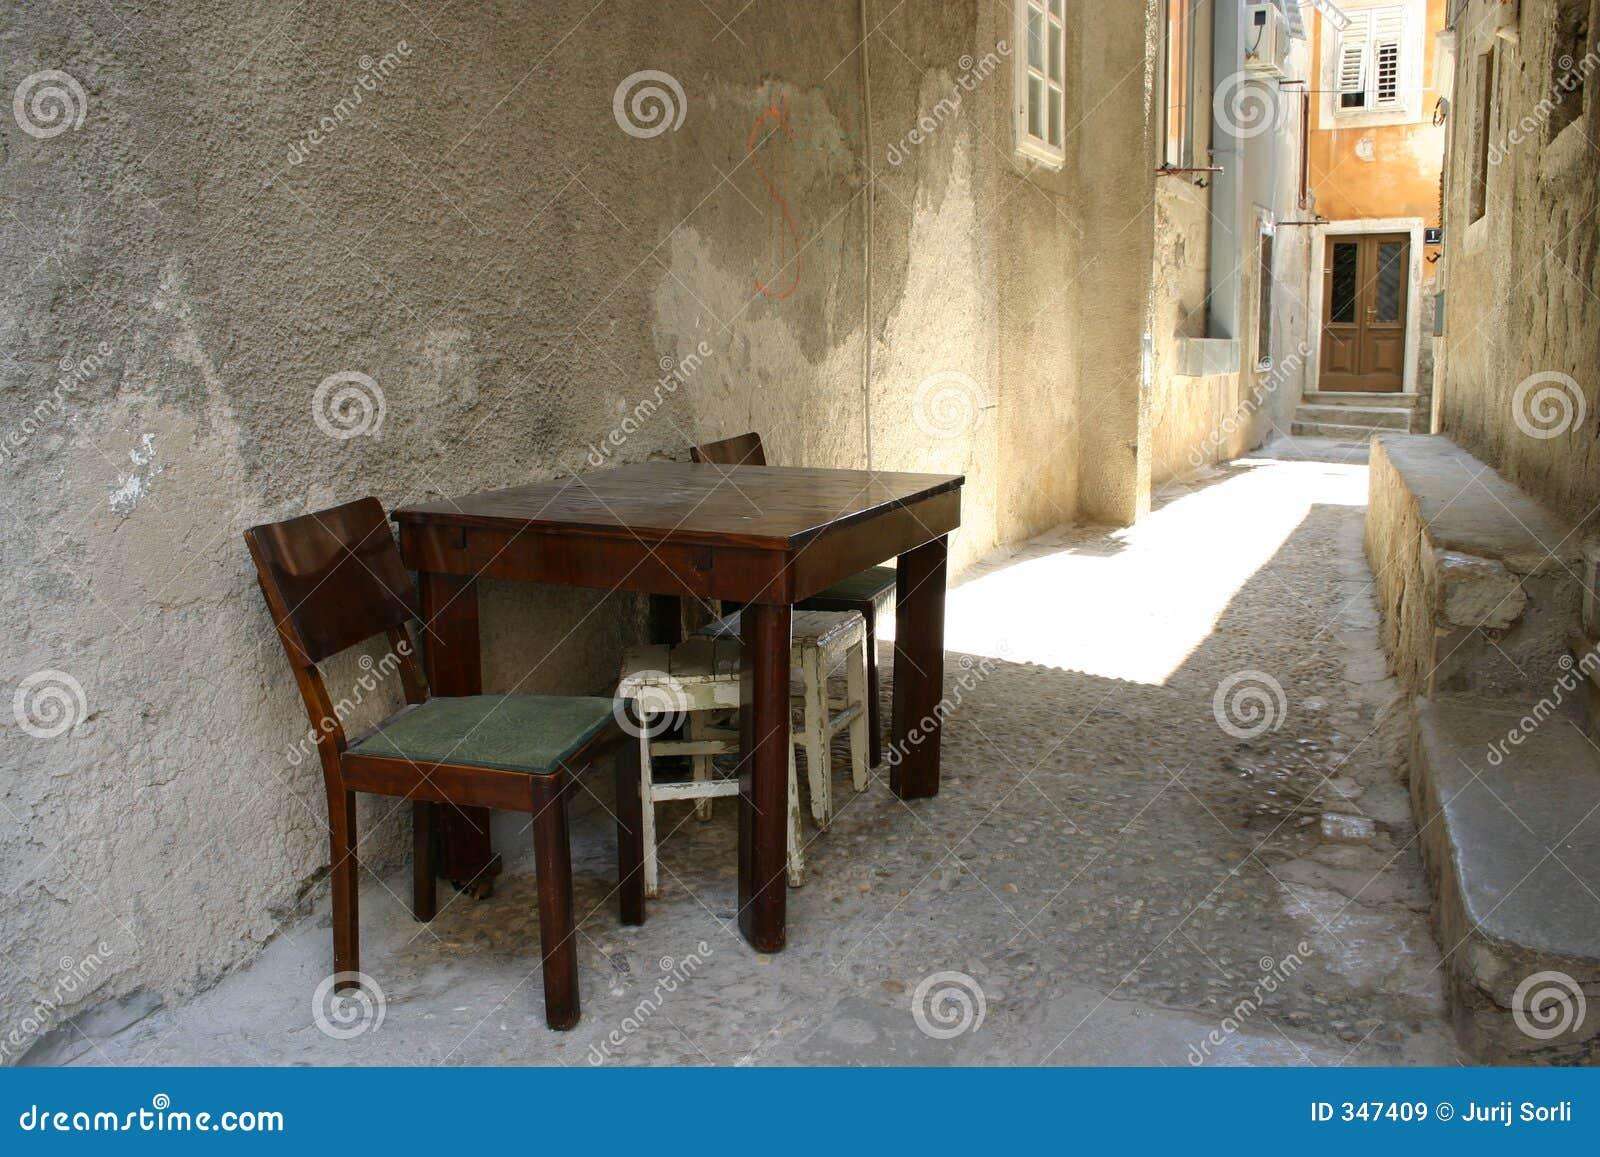 Still life - table&chair